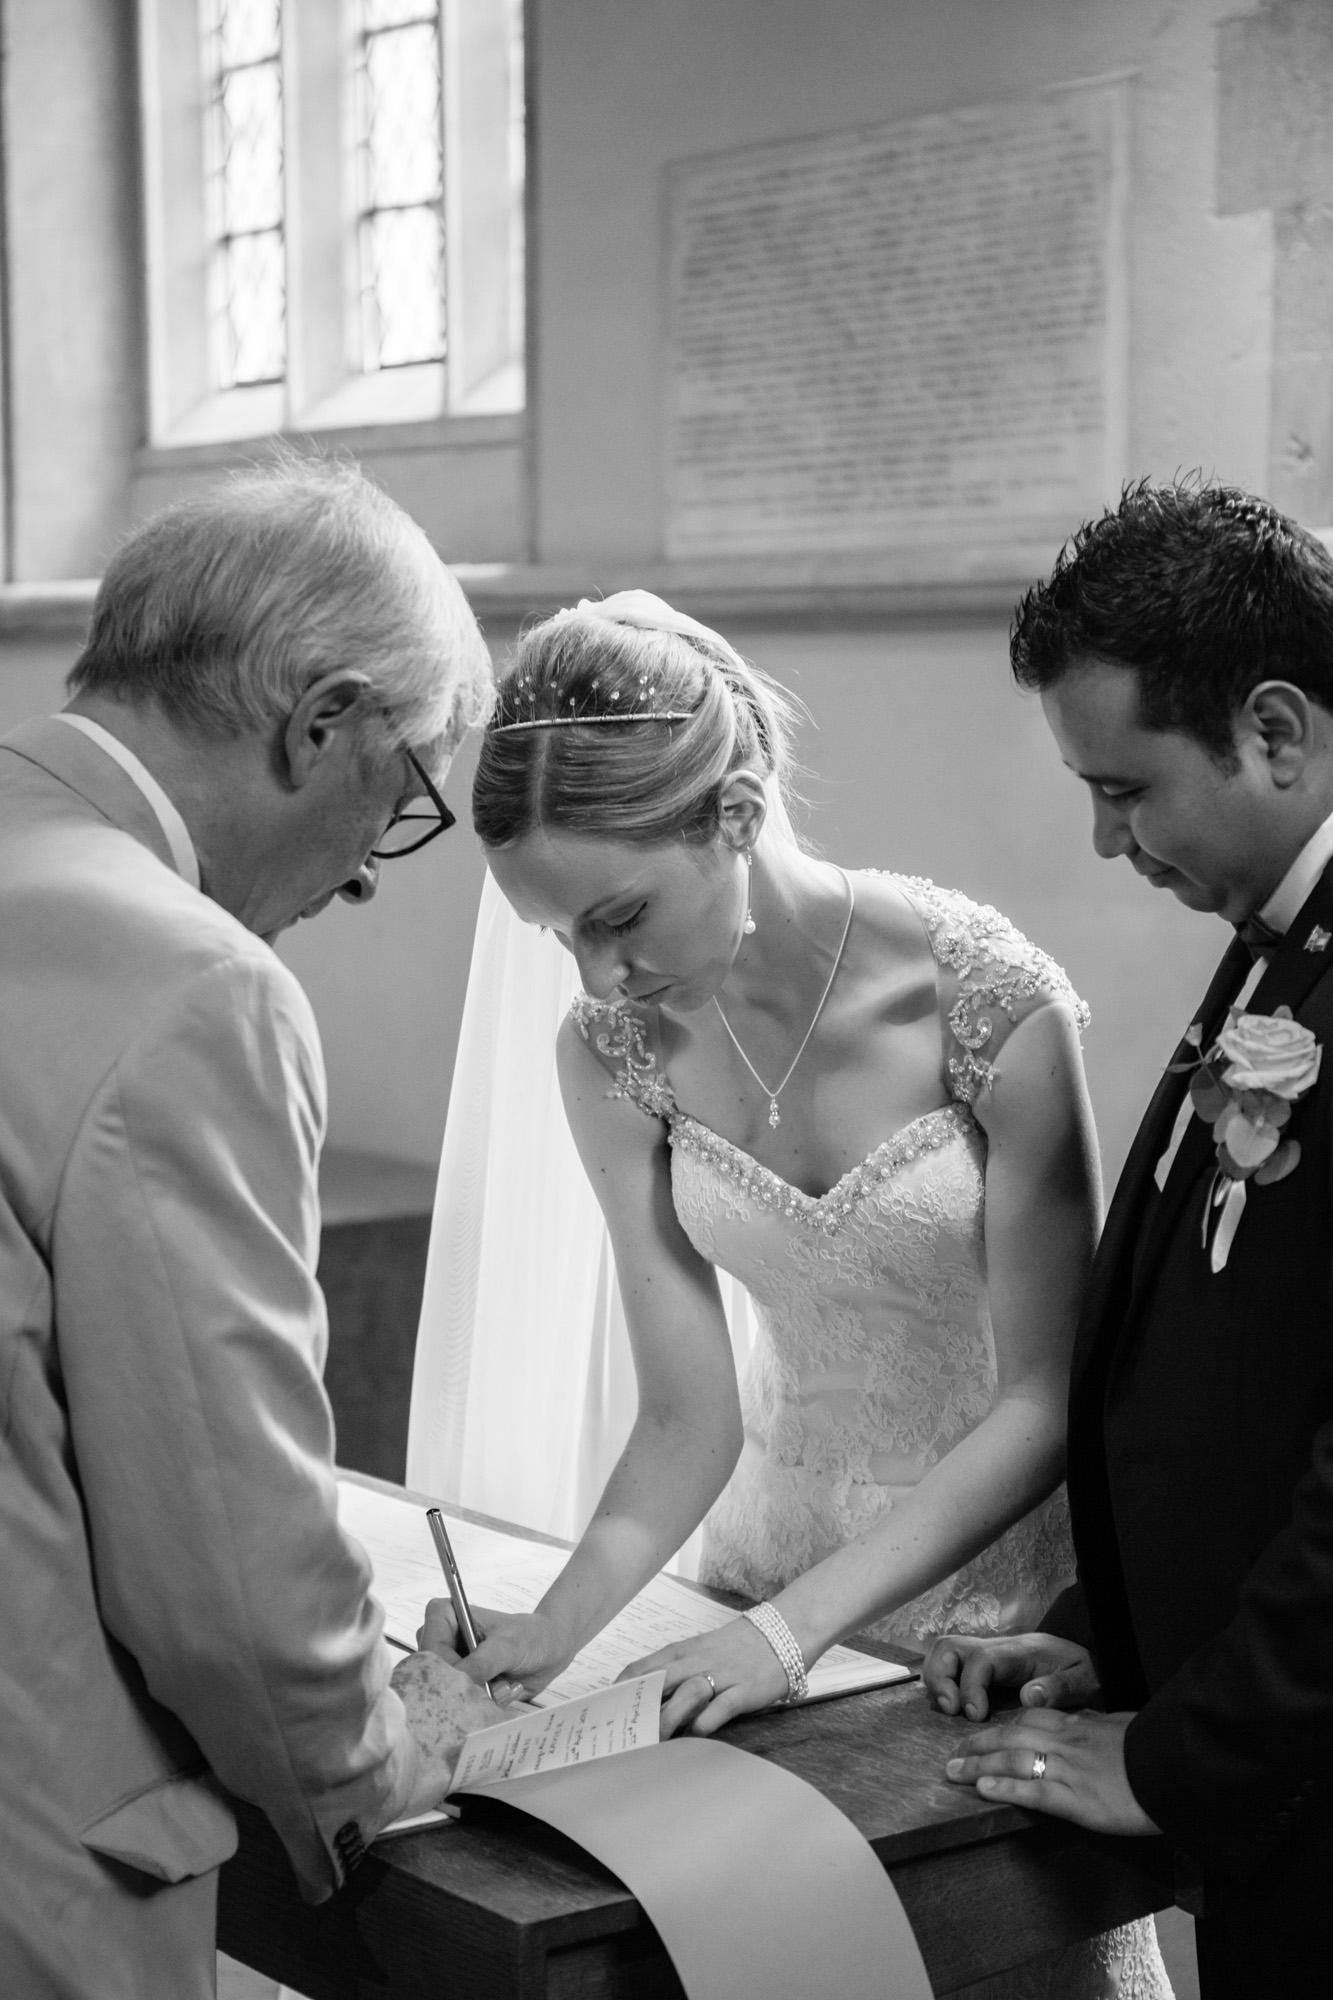 weddings-couples-love-photographer-oxford-london-jonathan-self-photography-39.jpg